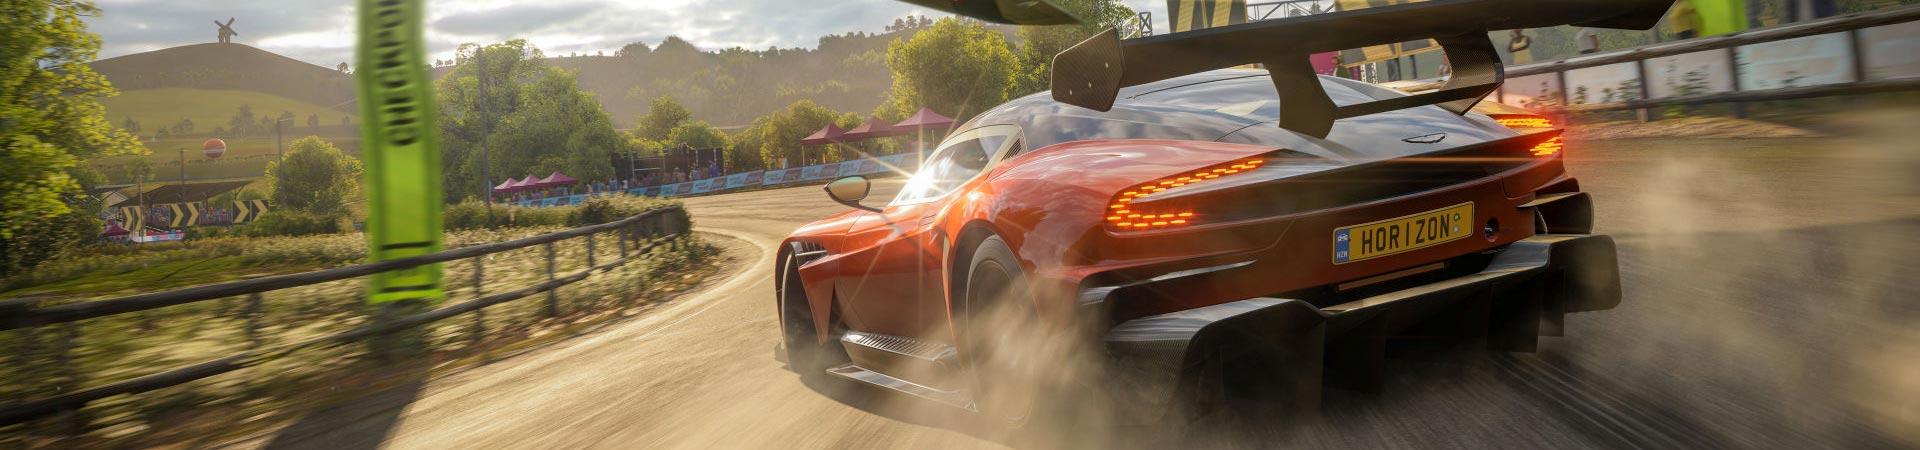 MainSlider-Forza007